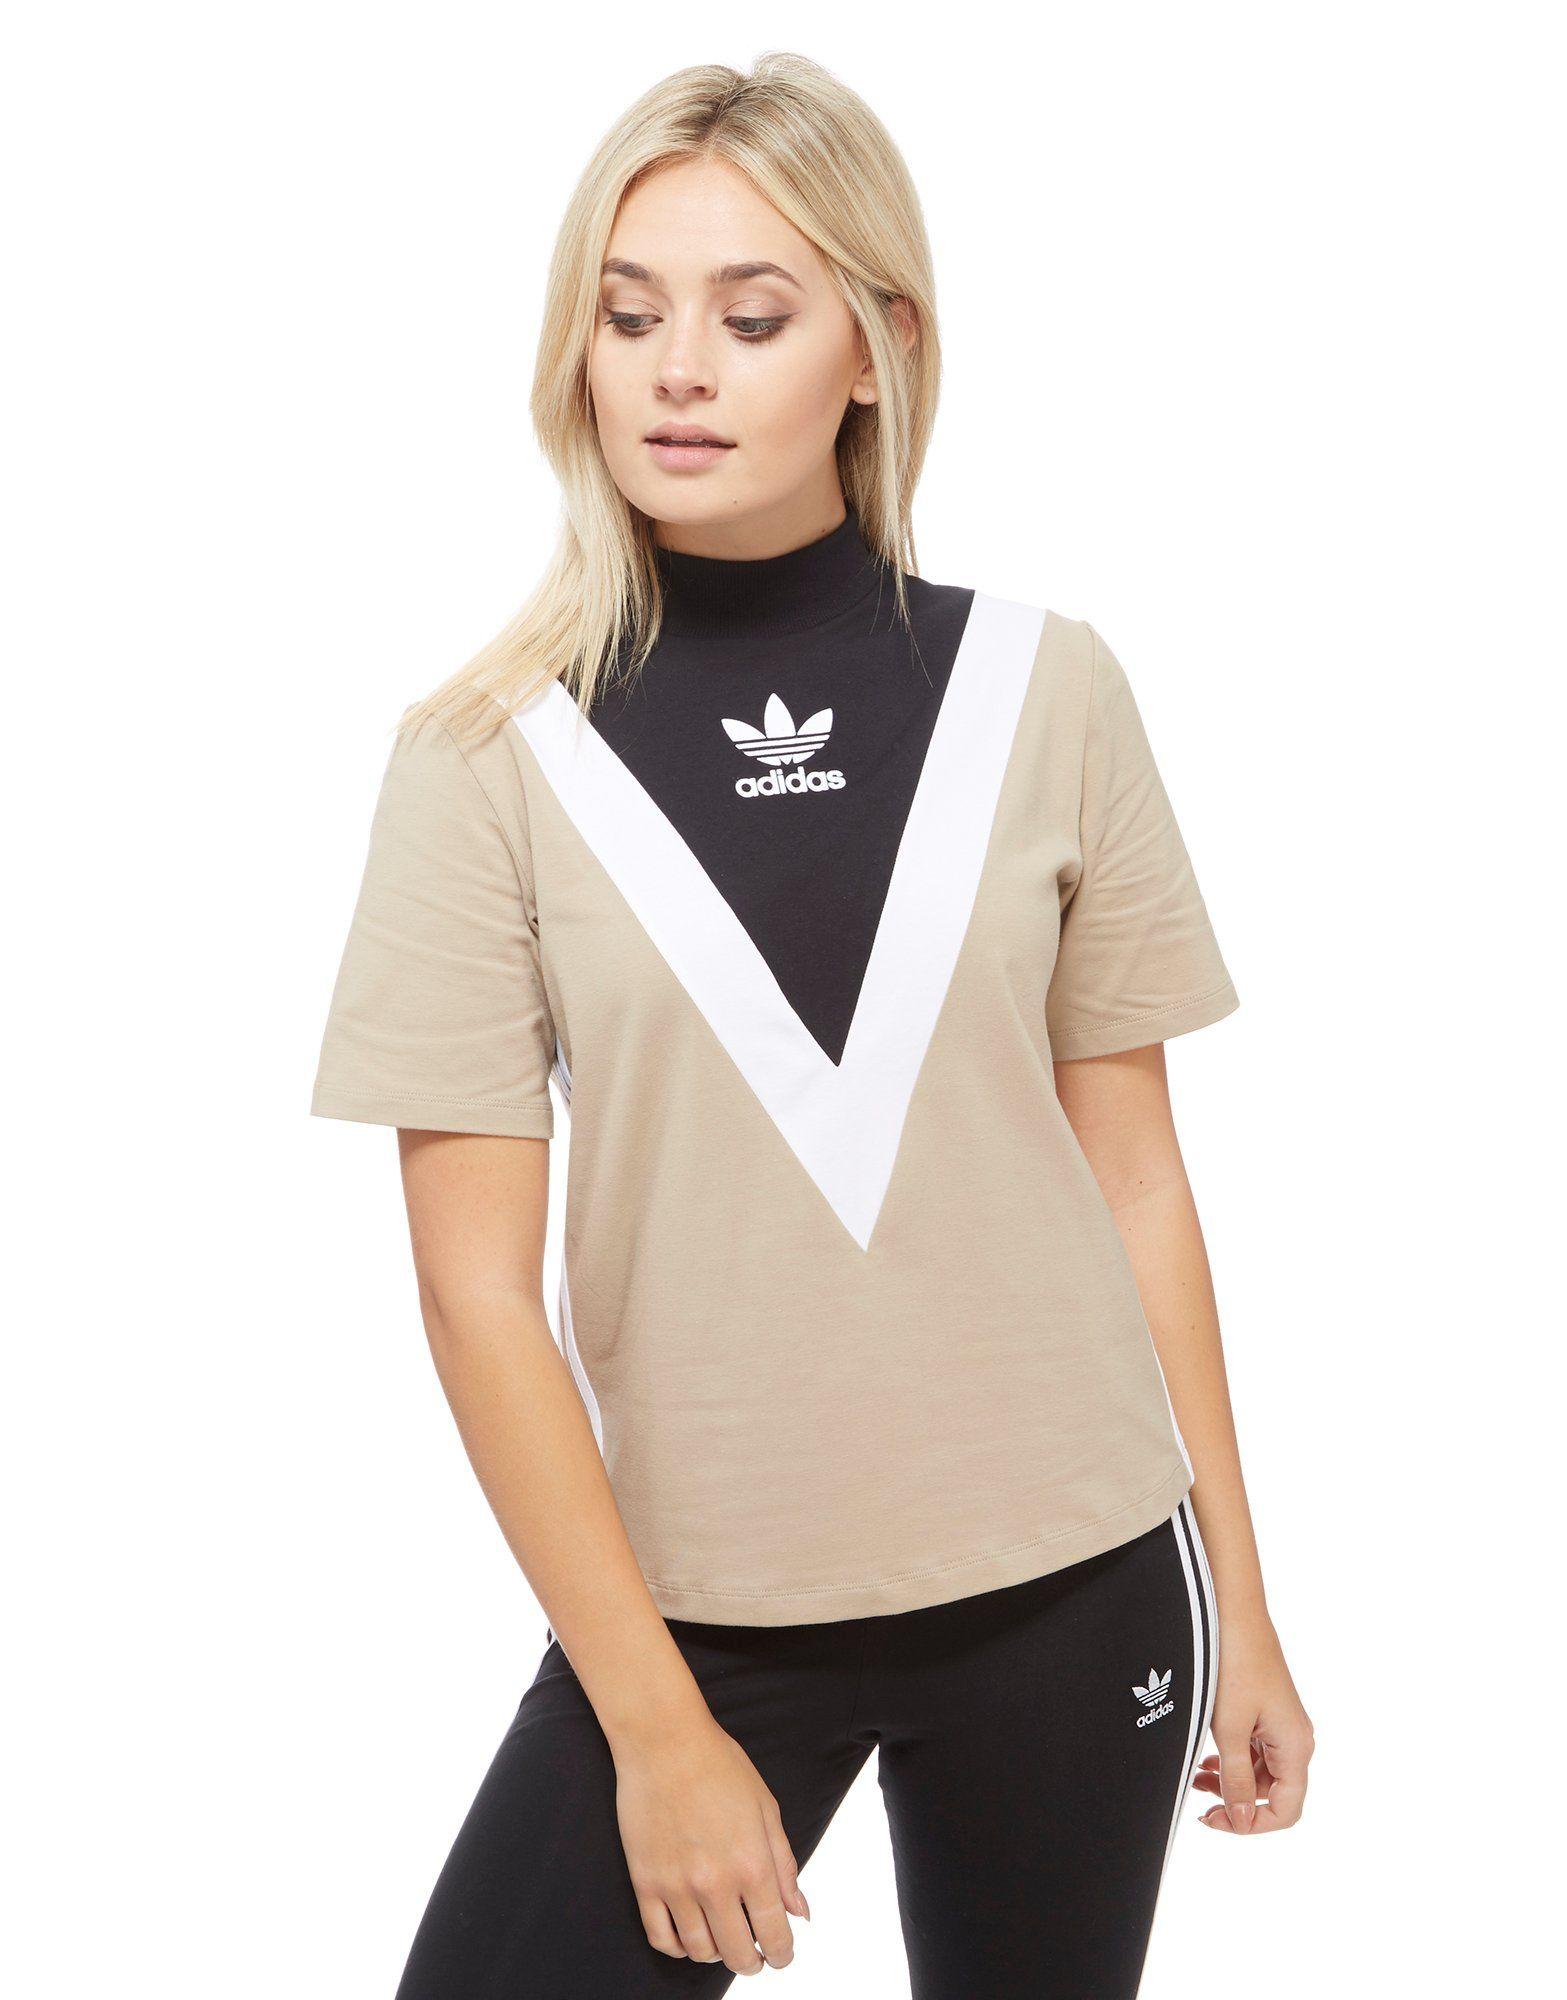 adidas Originals High Neck Chevron T-Shirt | JD Sports